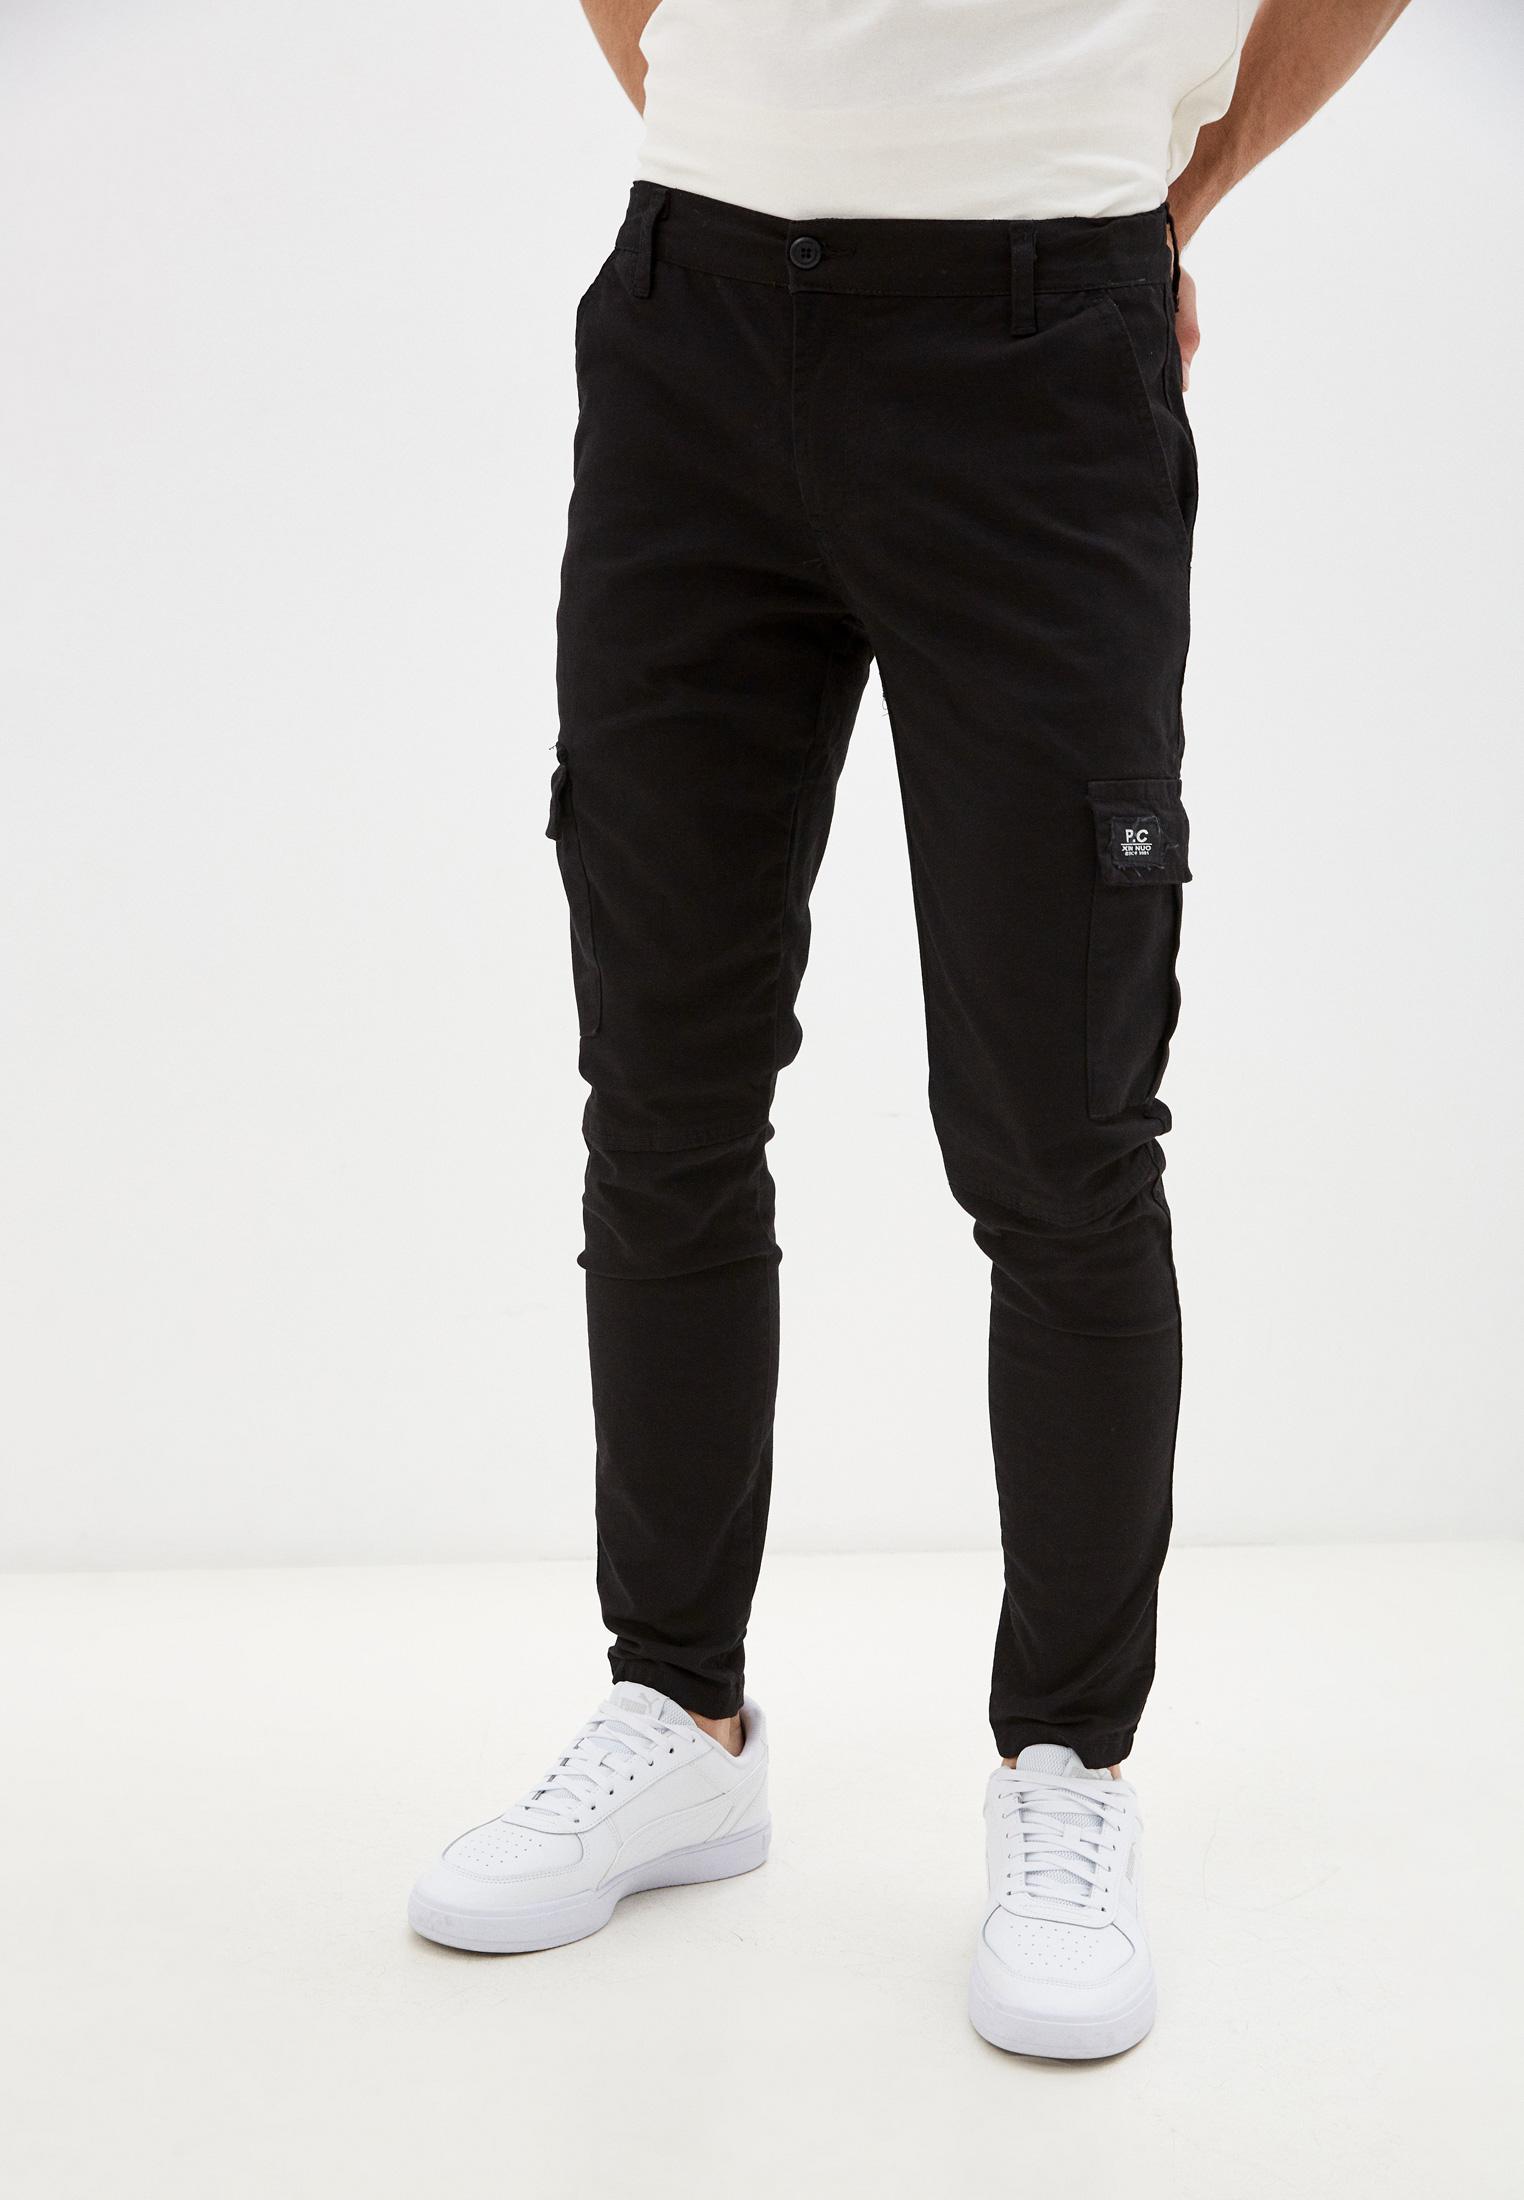 Мужские спортивные брюки Dali Брюки Dali